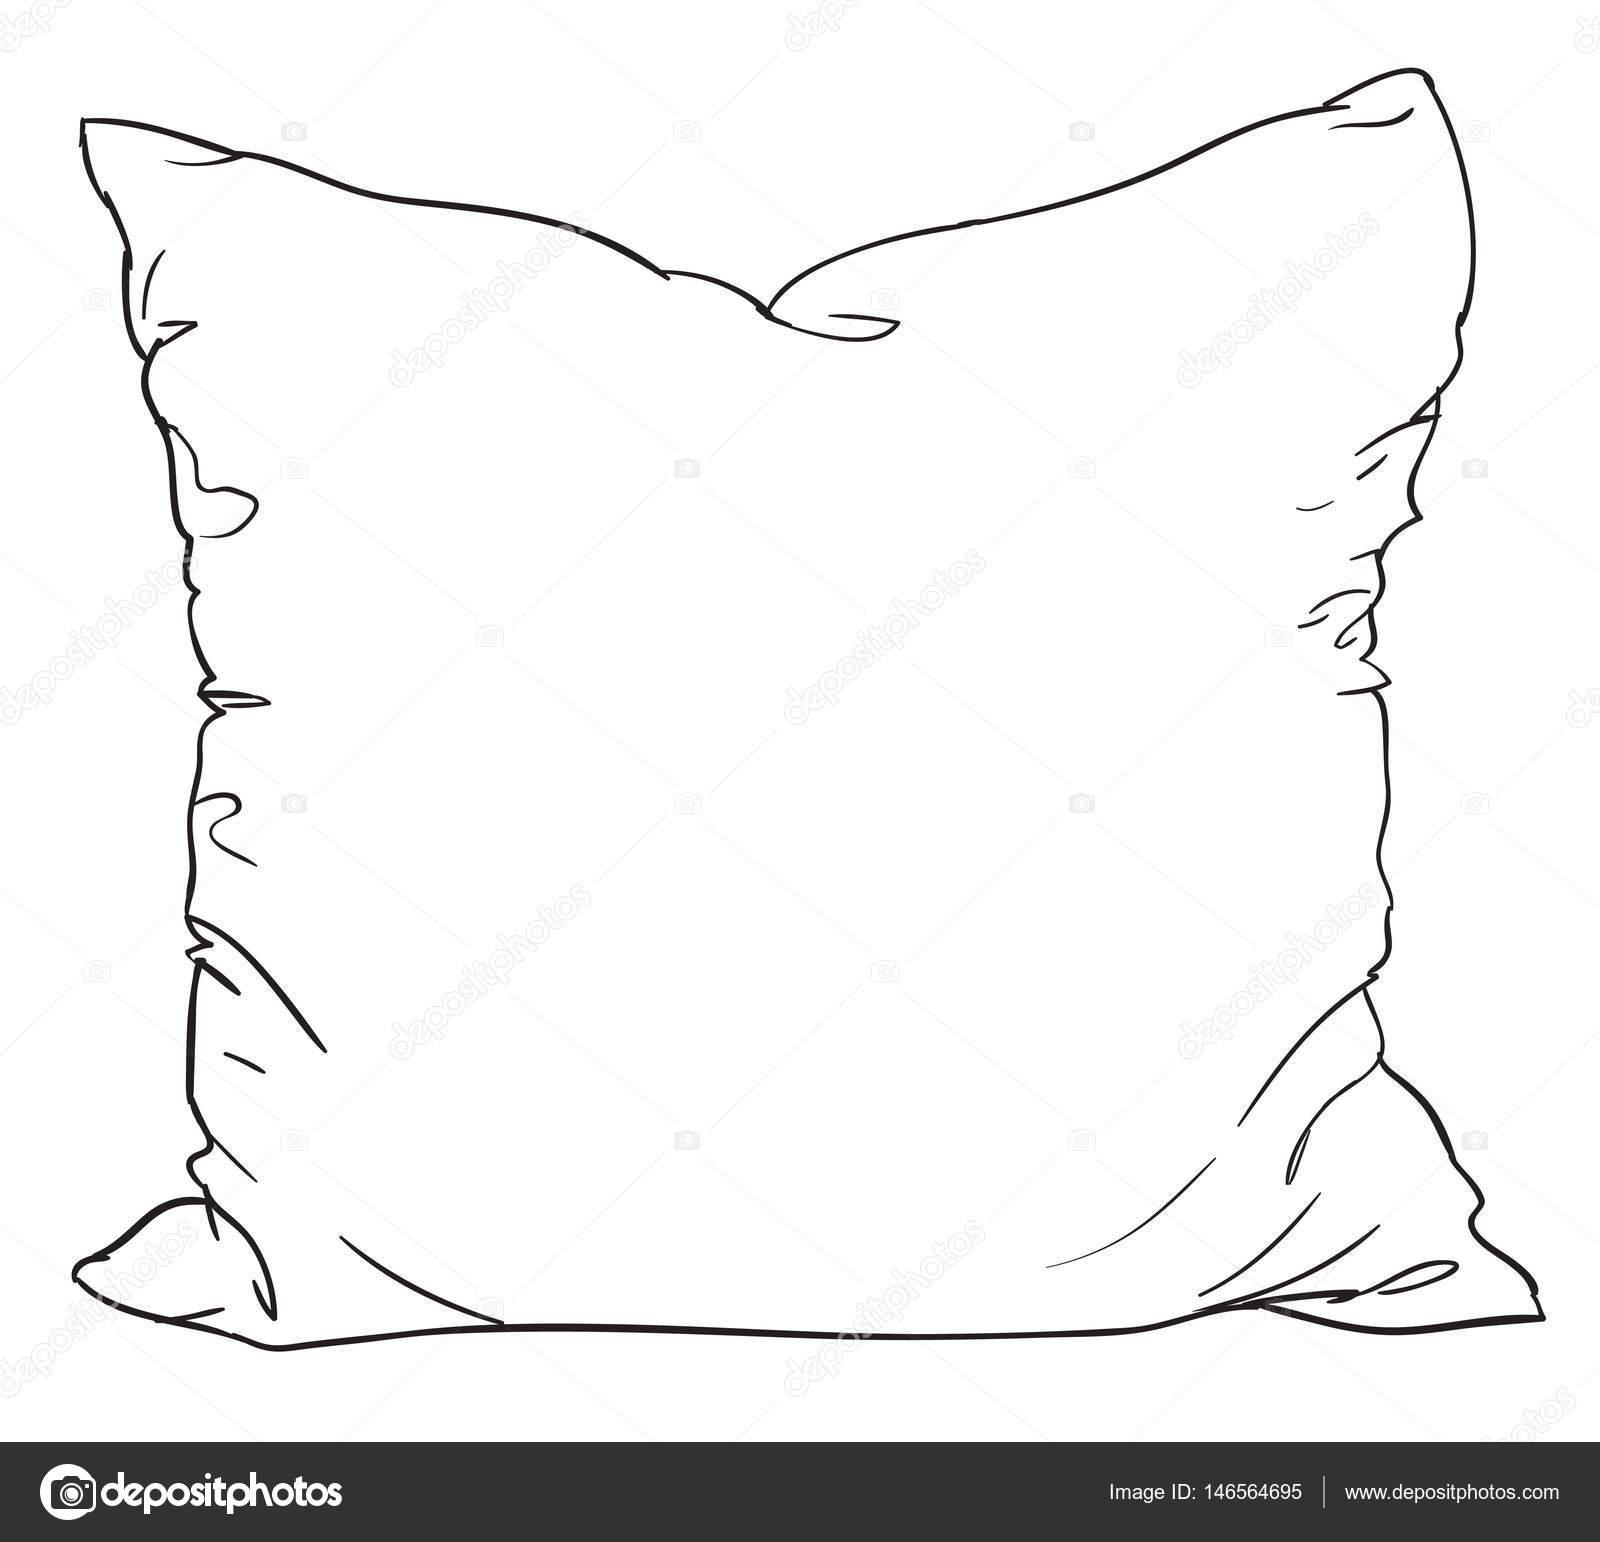 https depositphotos com 146564695 stock illustration sketch of bed pillow html